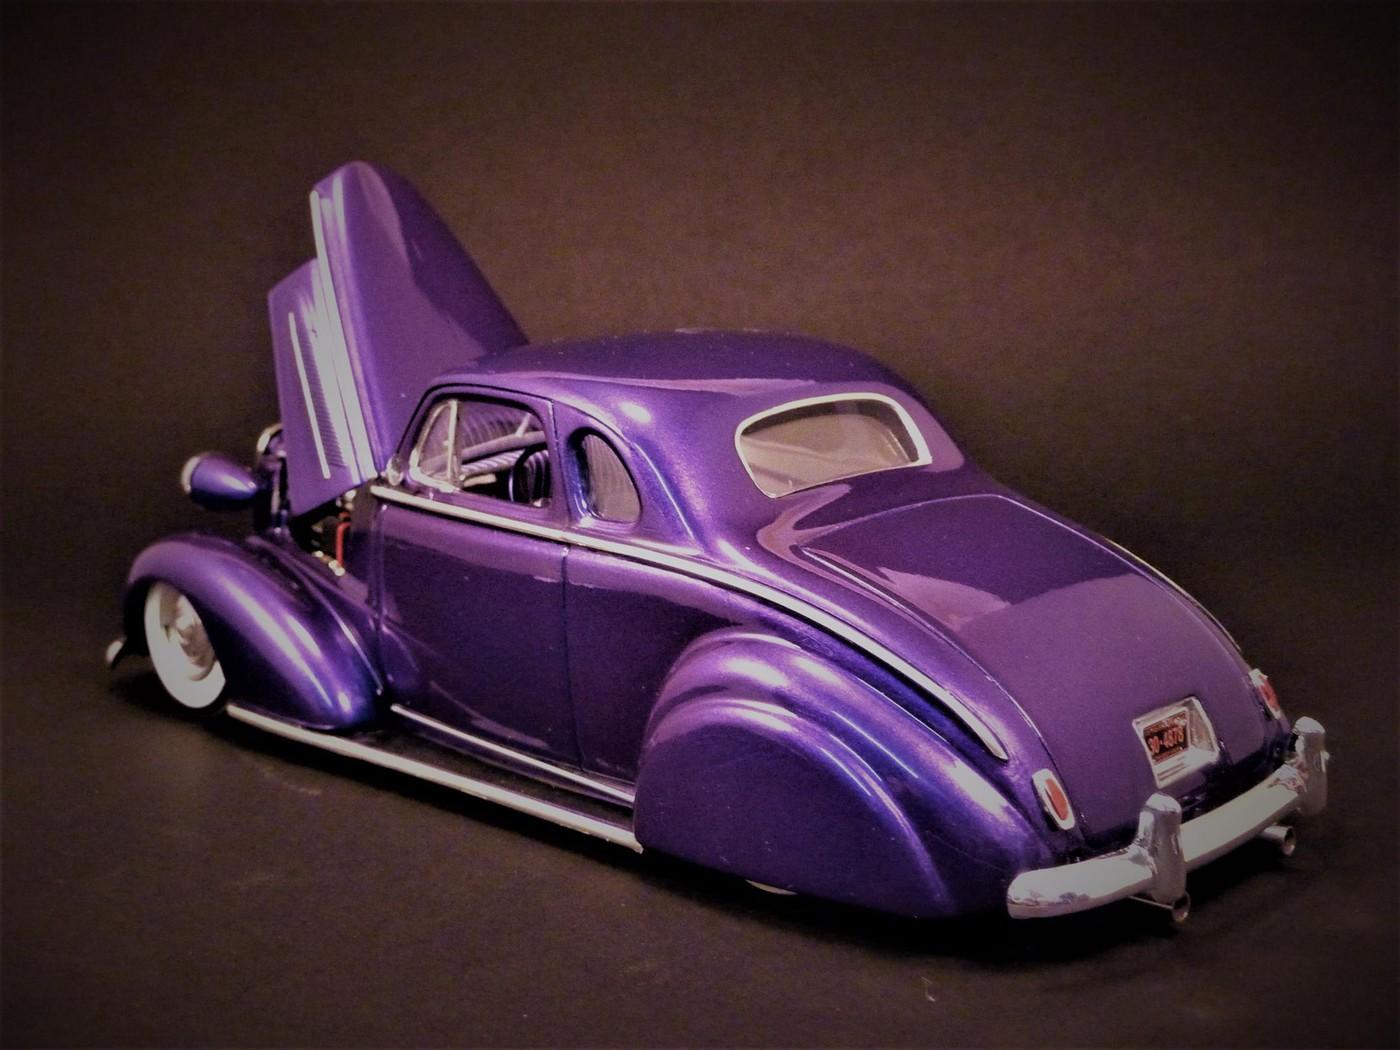 Projet Chevy 37 custom terminée  - Page 2 Photo65-vi